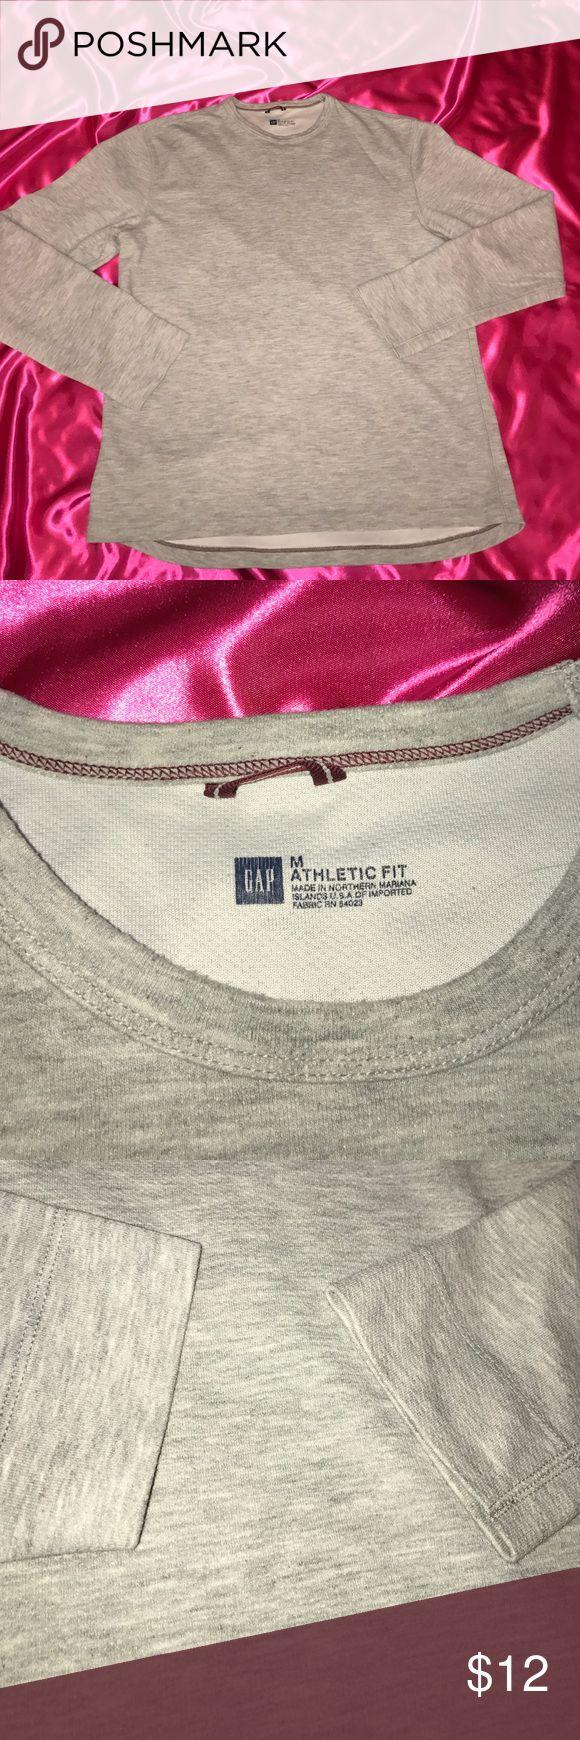 GAP sweatshirt GAP long sleeve sweat shirt light gray athletic fit M GAP Sweaters Crew & Scoop Necks